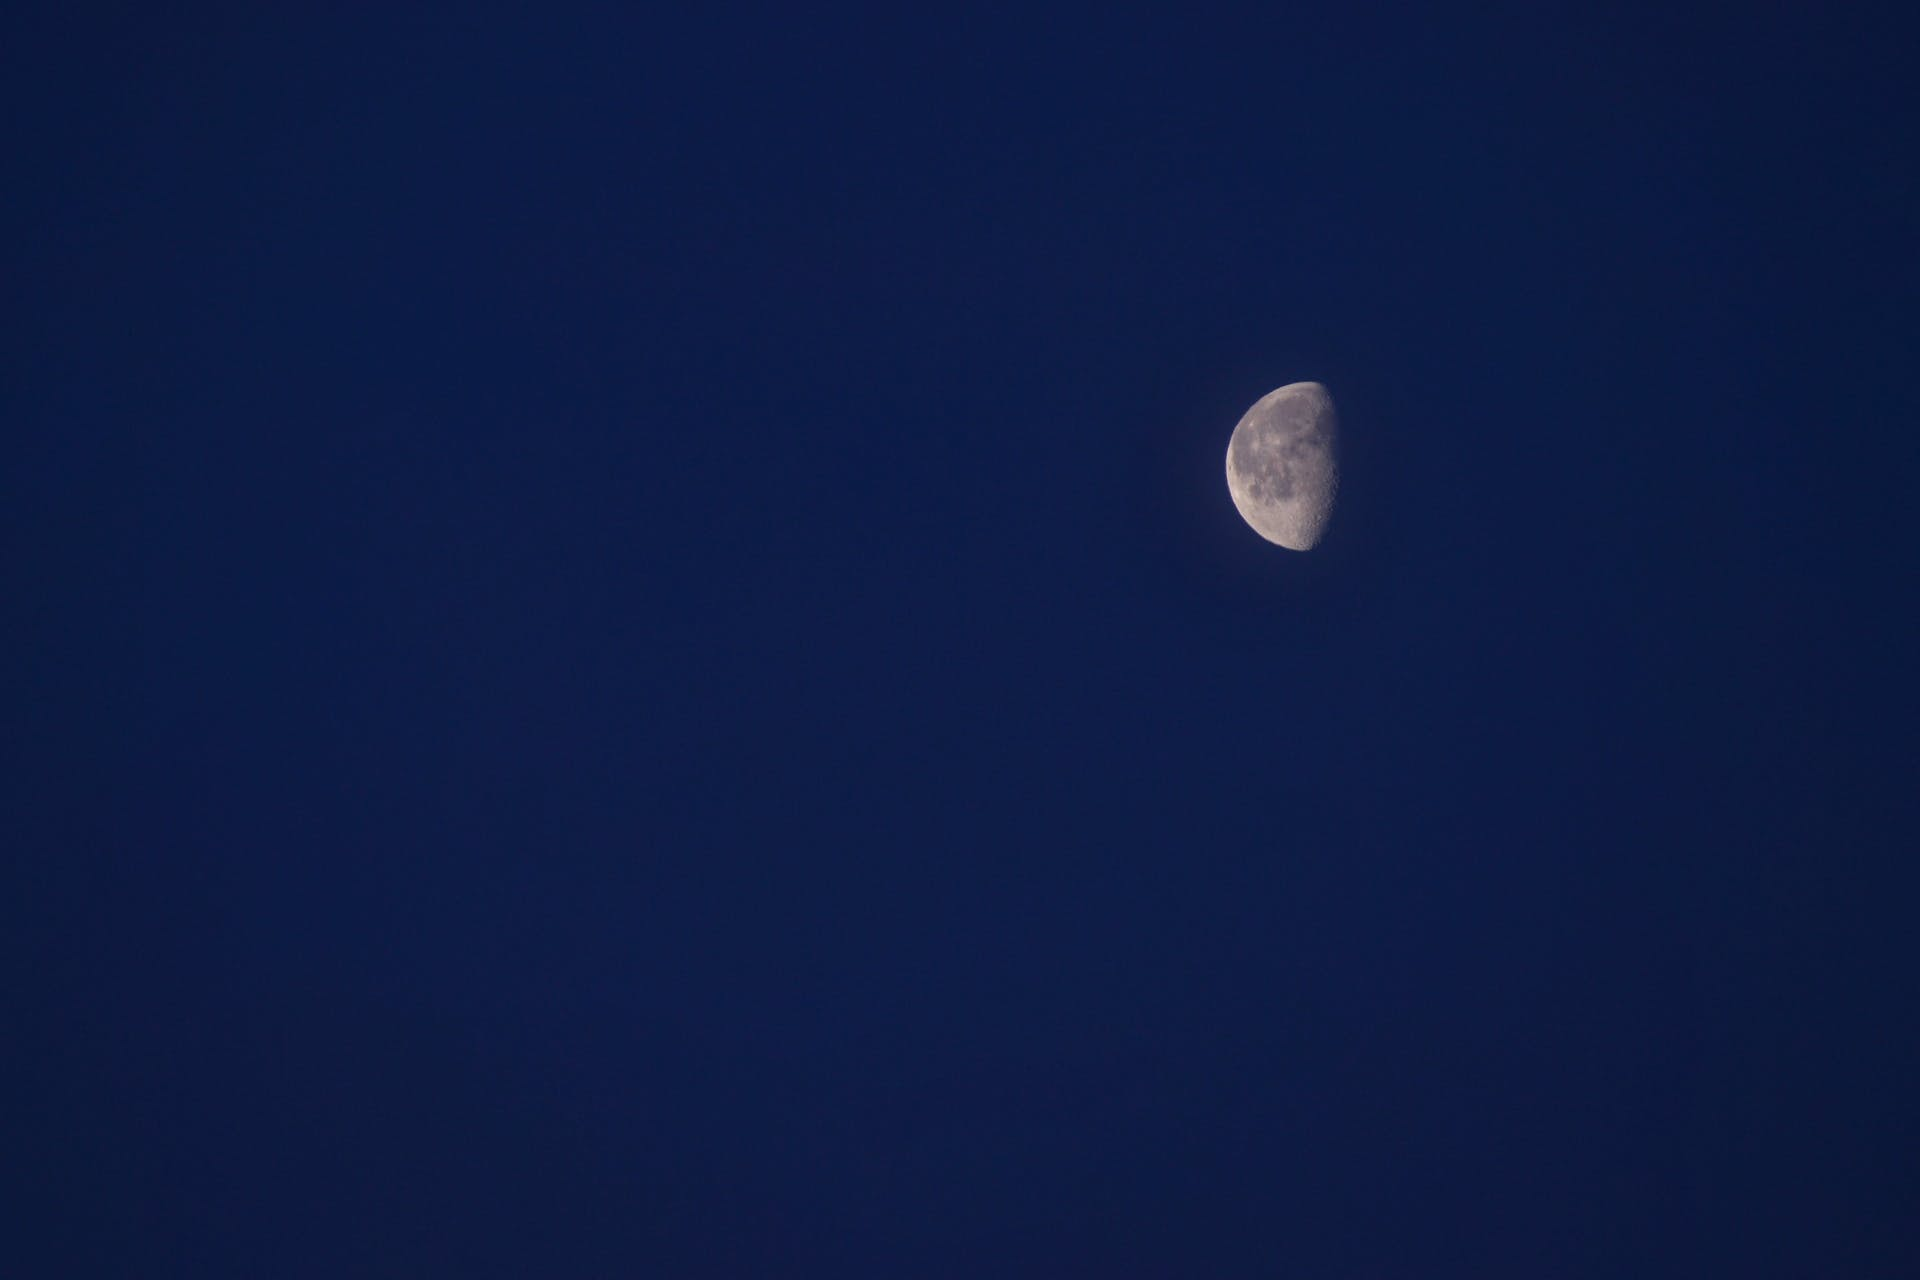 moon luna space night astronomy moonlight lunar